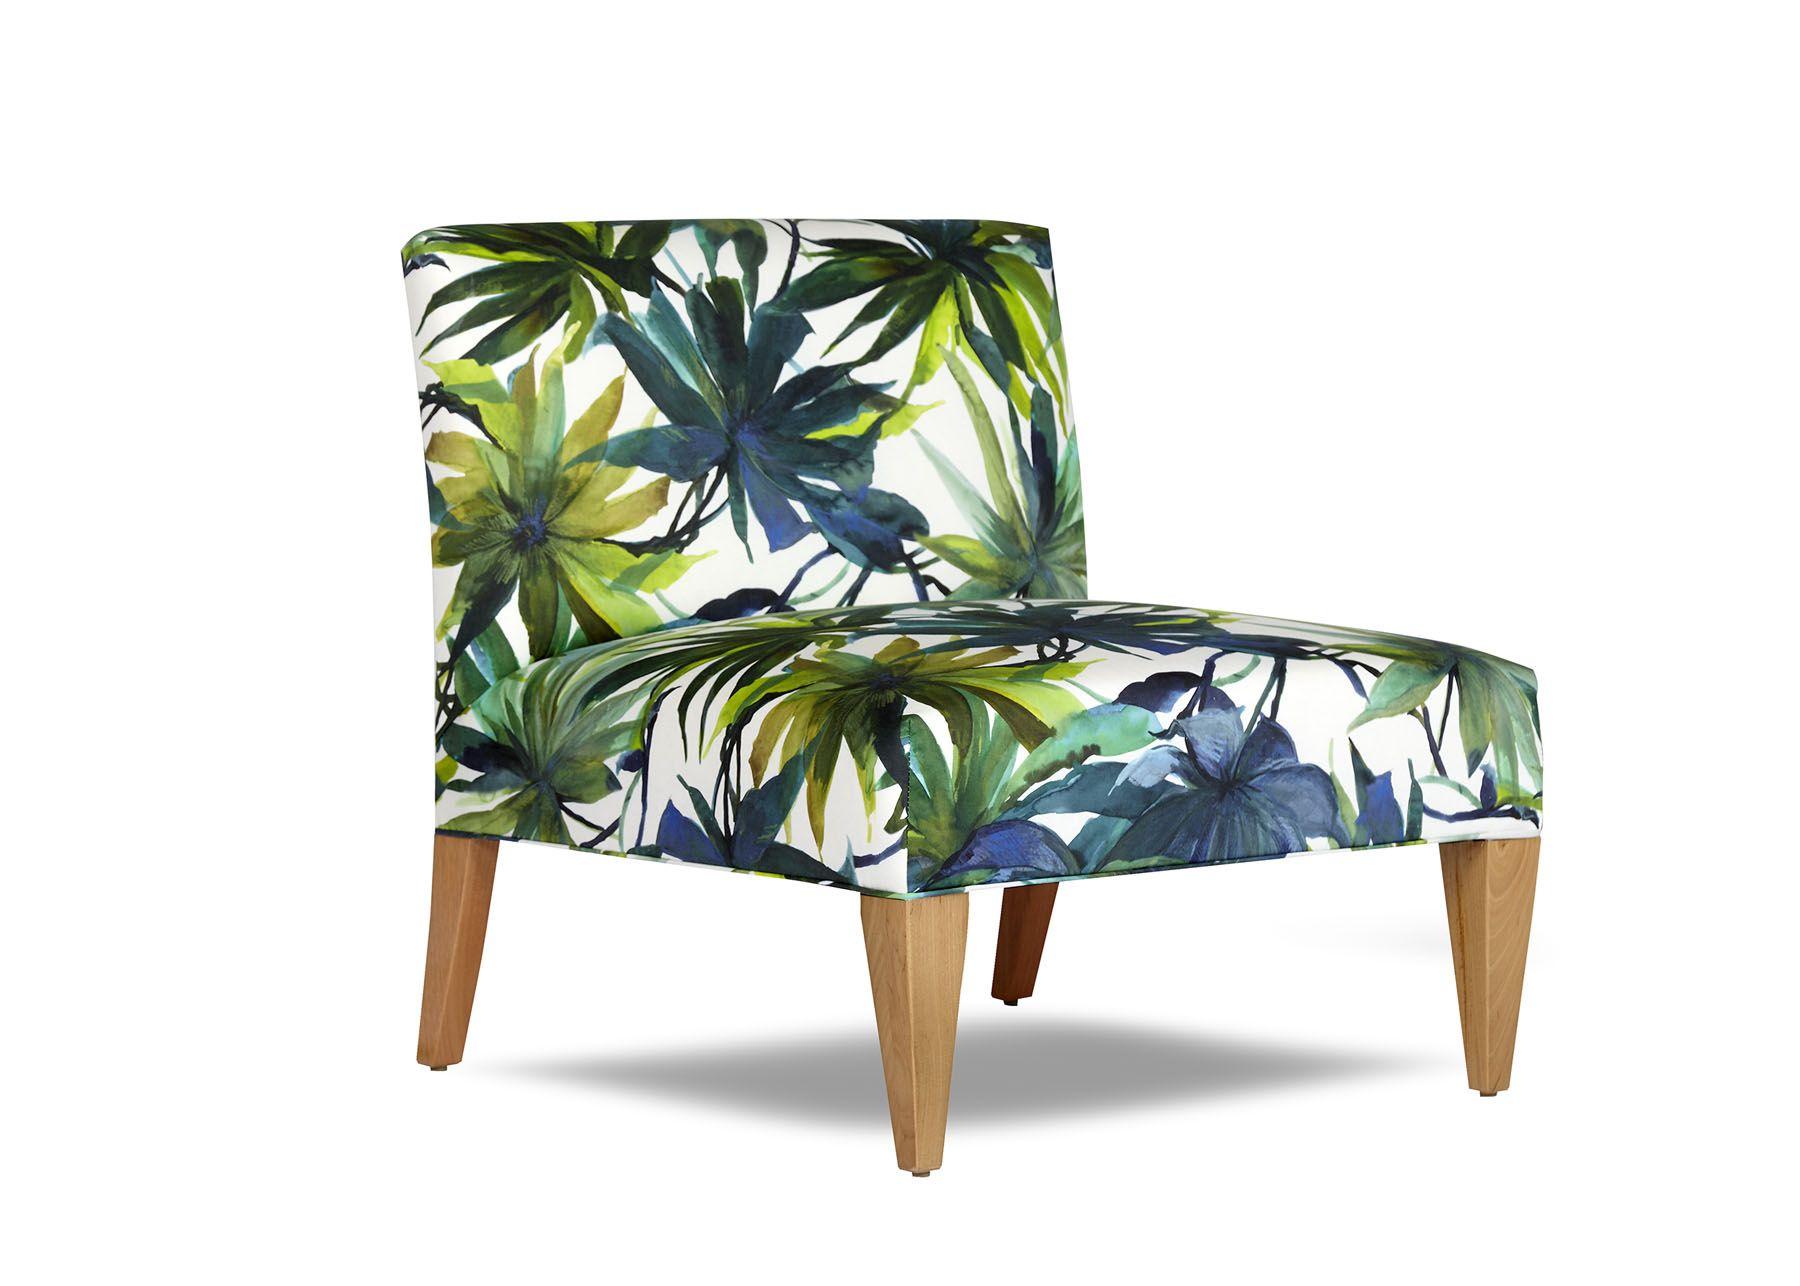 Coco Chair by Arthur G Armless Tropical Upholstery